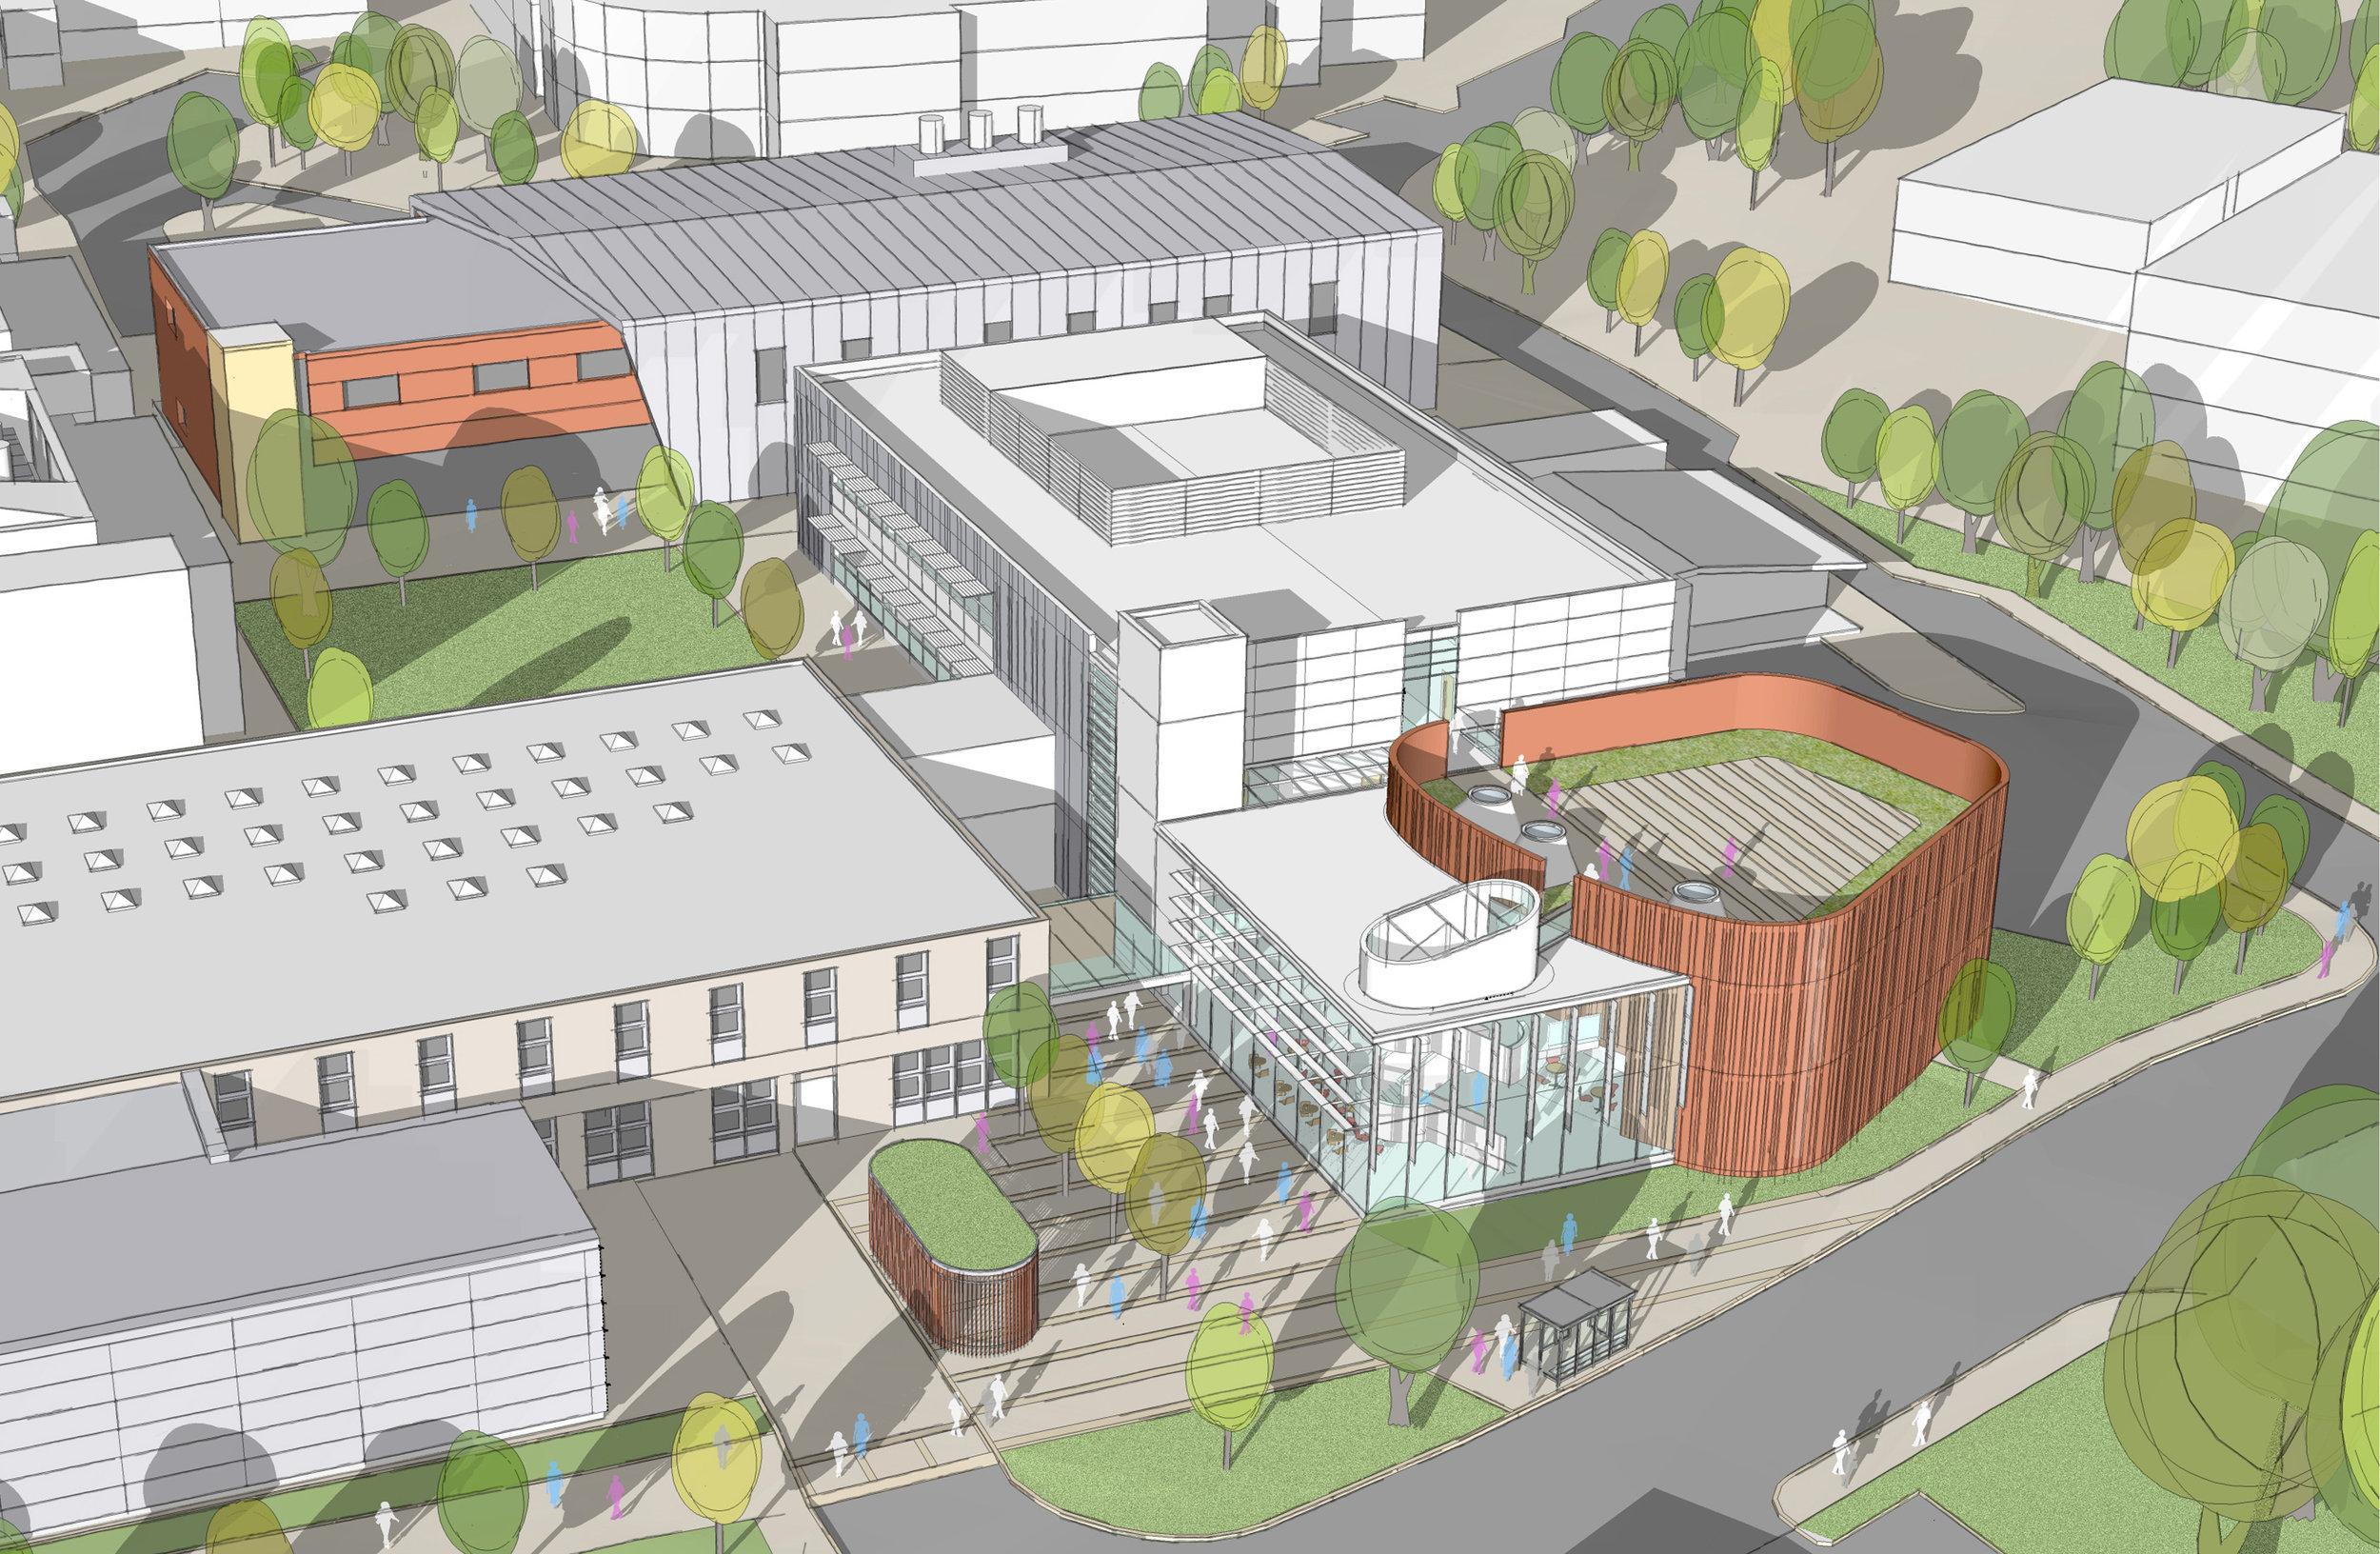 Stephen-Hill-Architects-Chemistry-Building-York-02